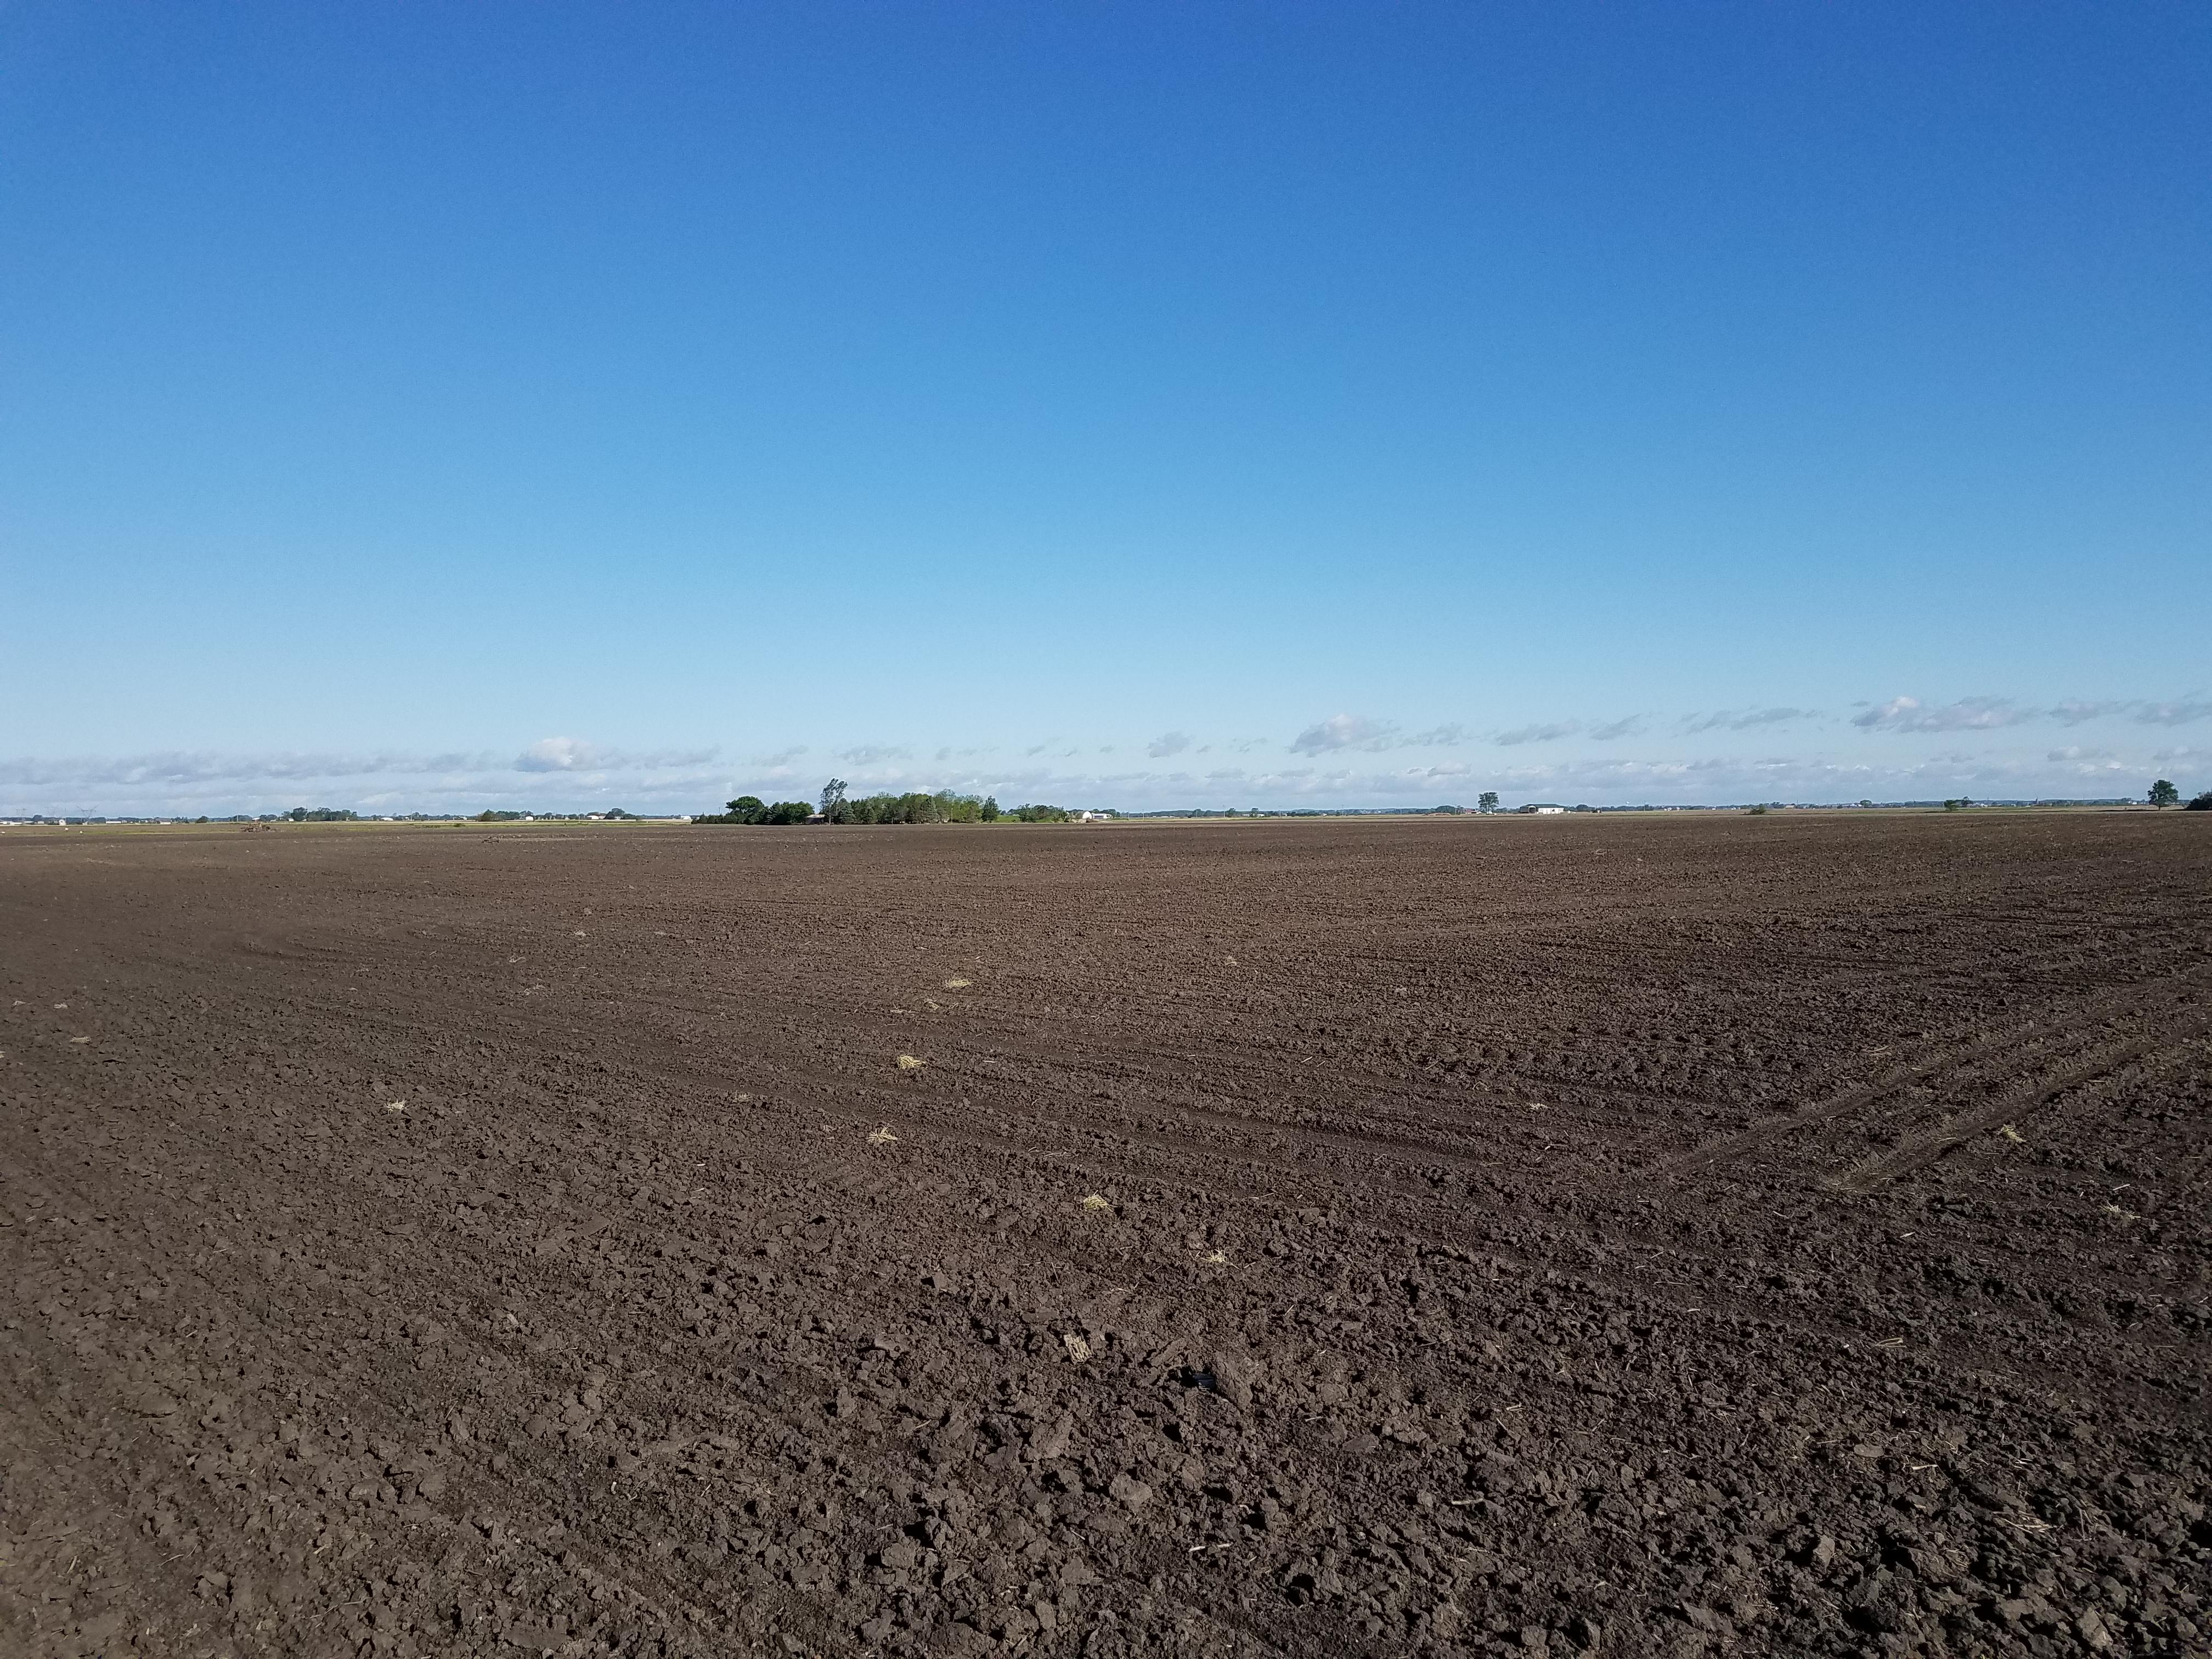 Phebus Mccoy Farm Picture of Field